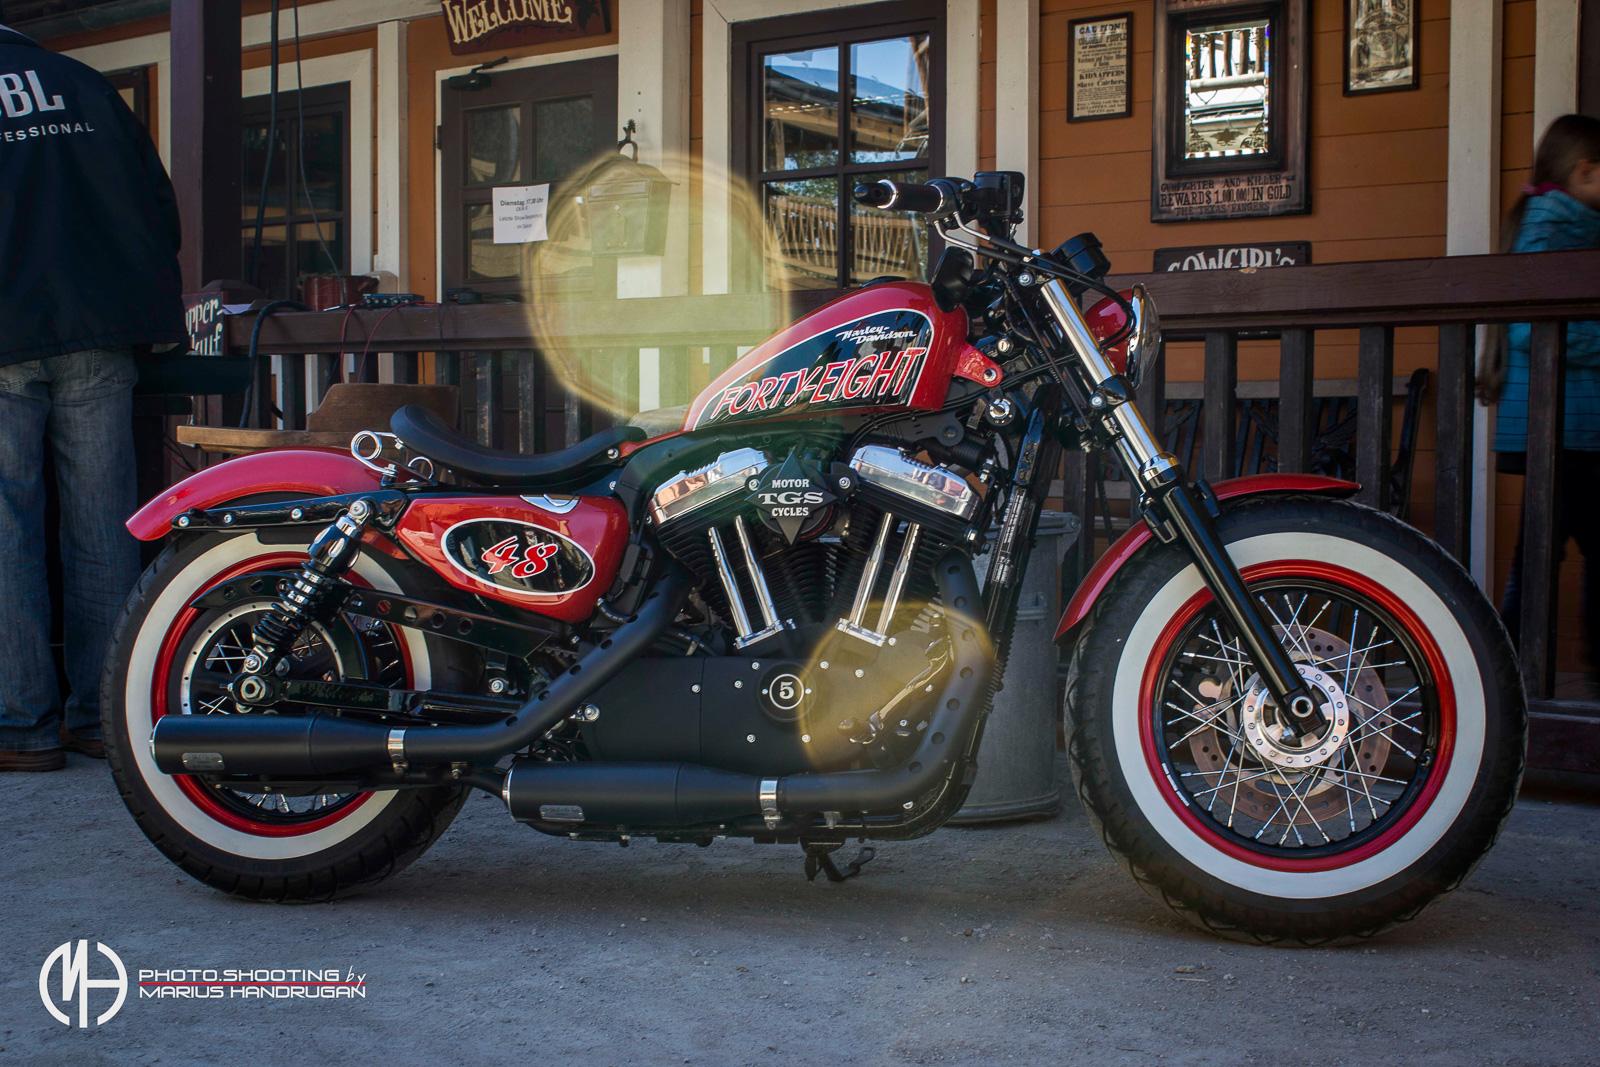 Profesionelle Motorrad Bilder